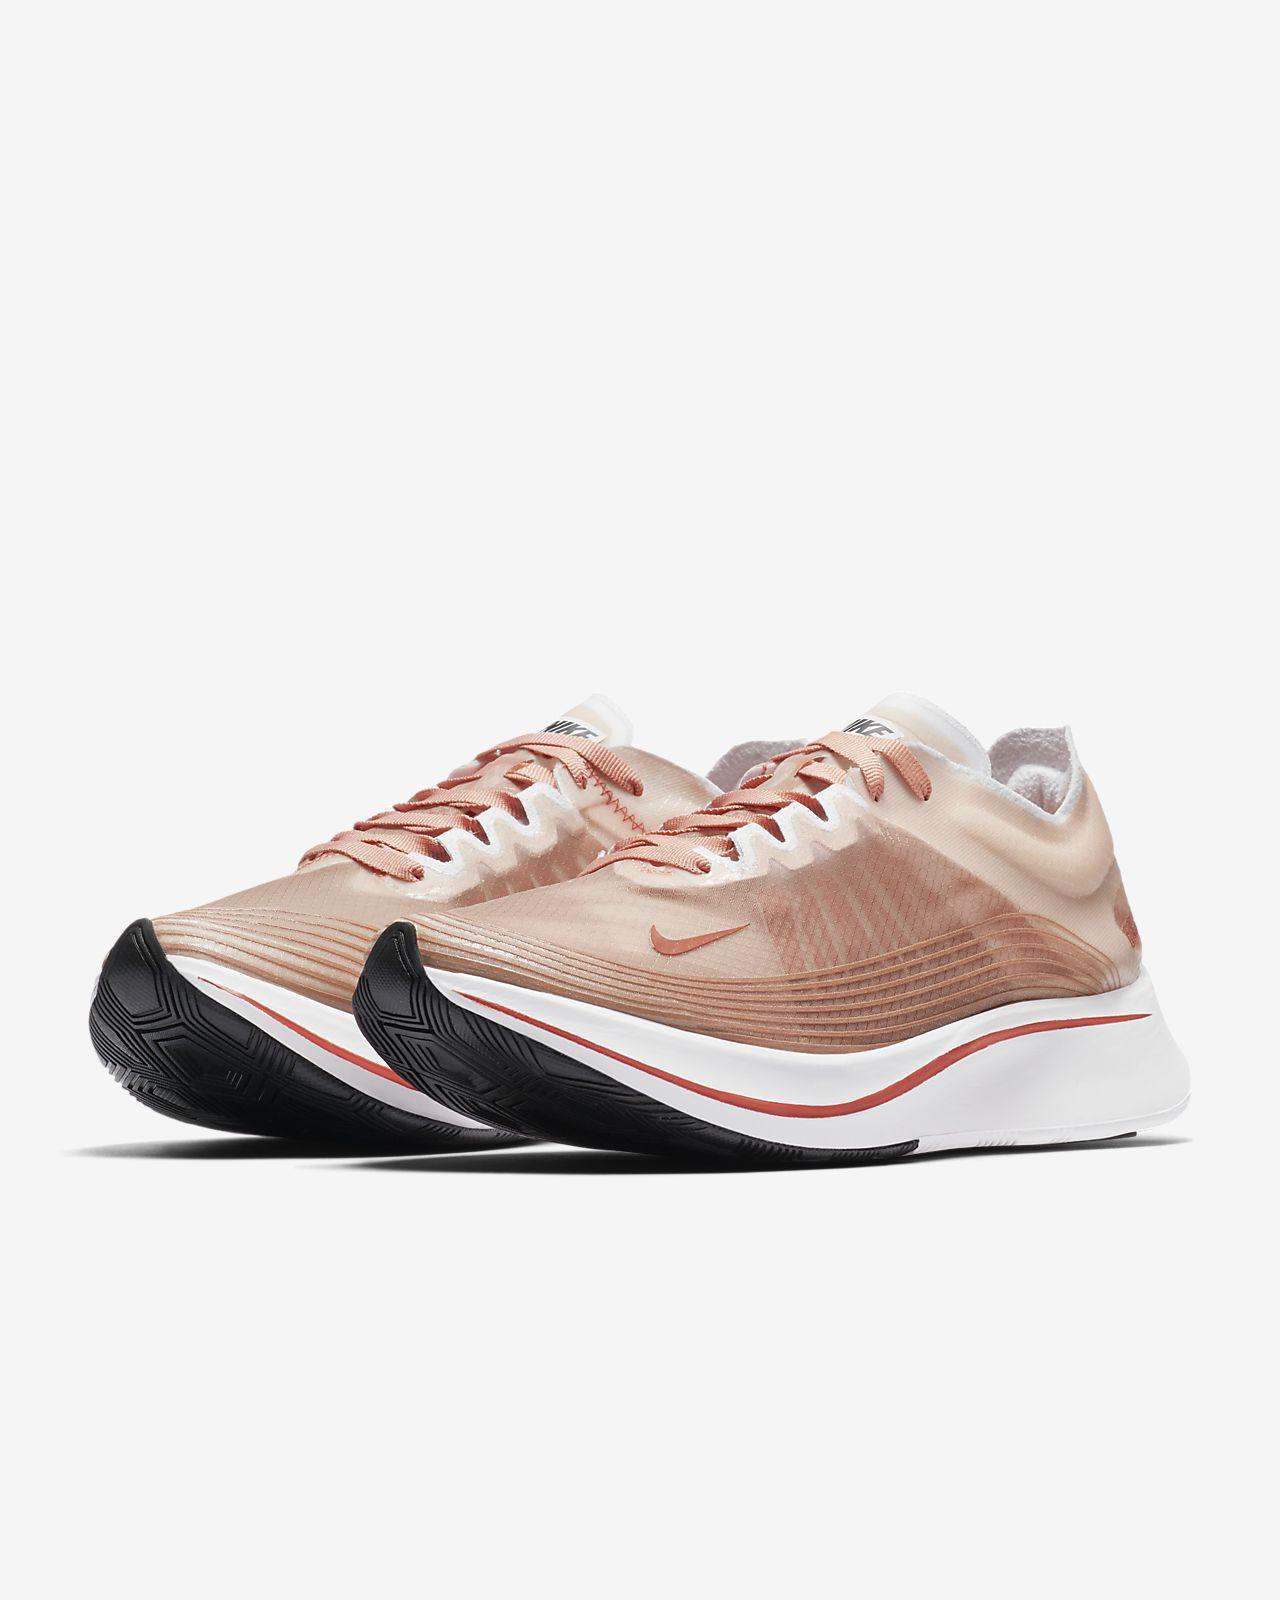 a2094a0a05b4d Nike Zoom Fly SP Women s Running Shoe. Nike.com SG